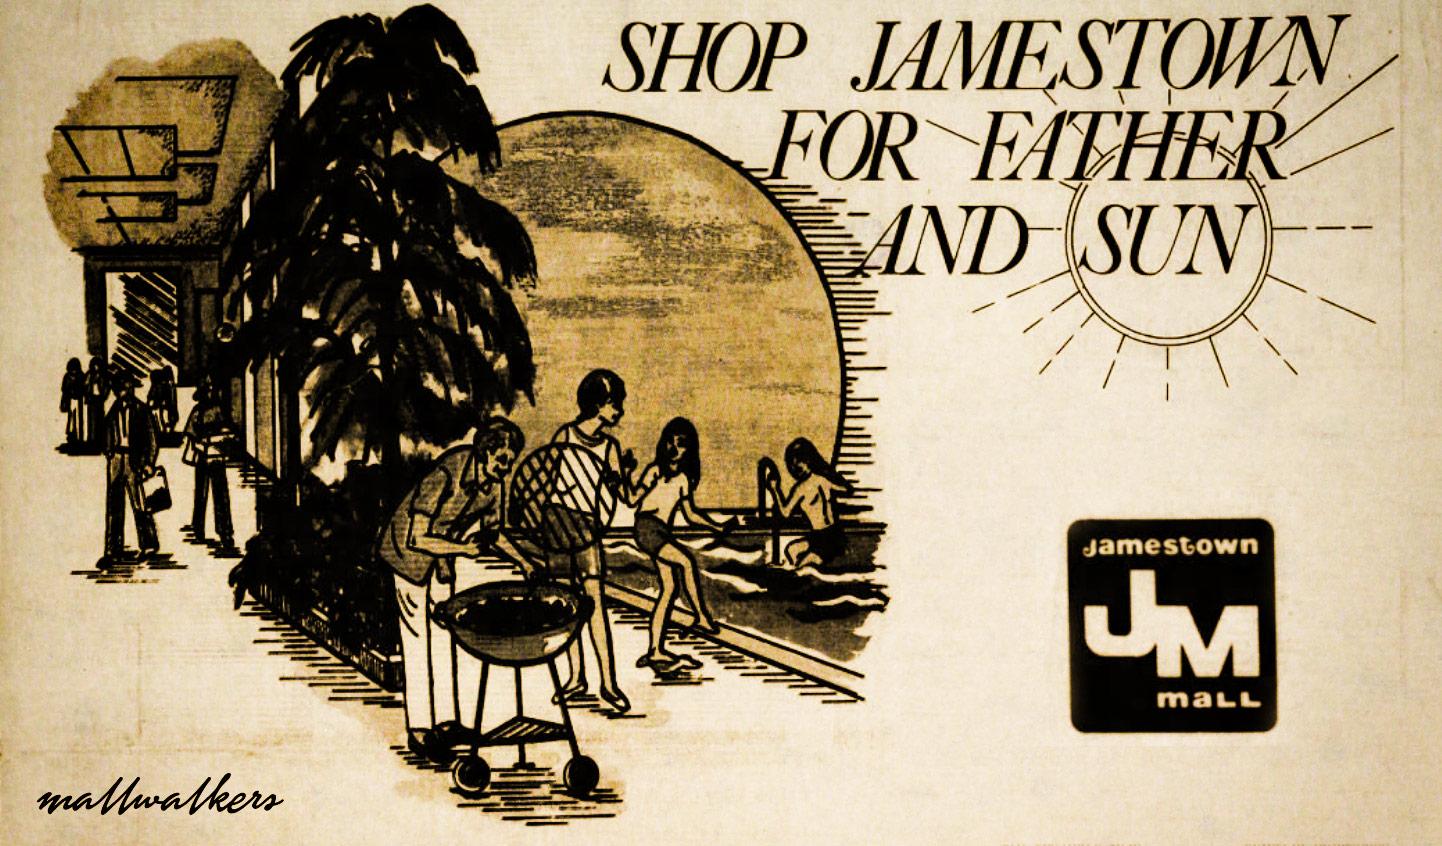 Jamestown Mall Advertisement